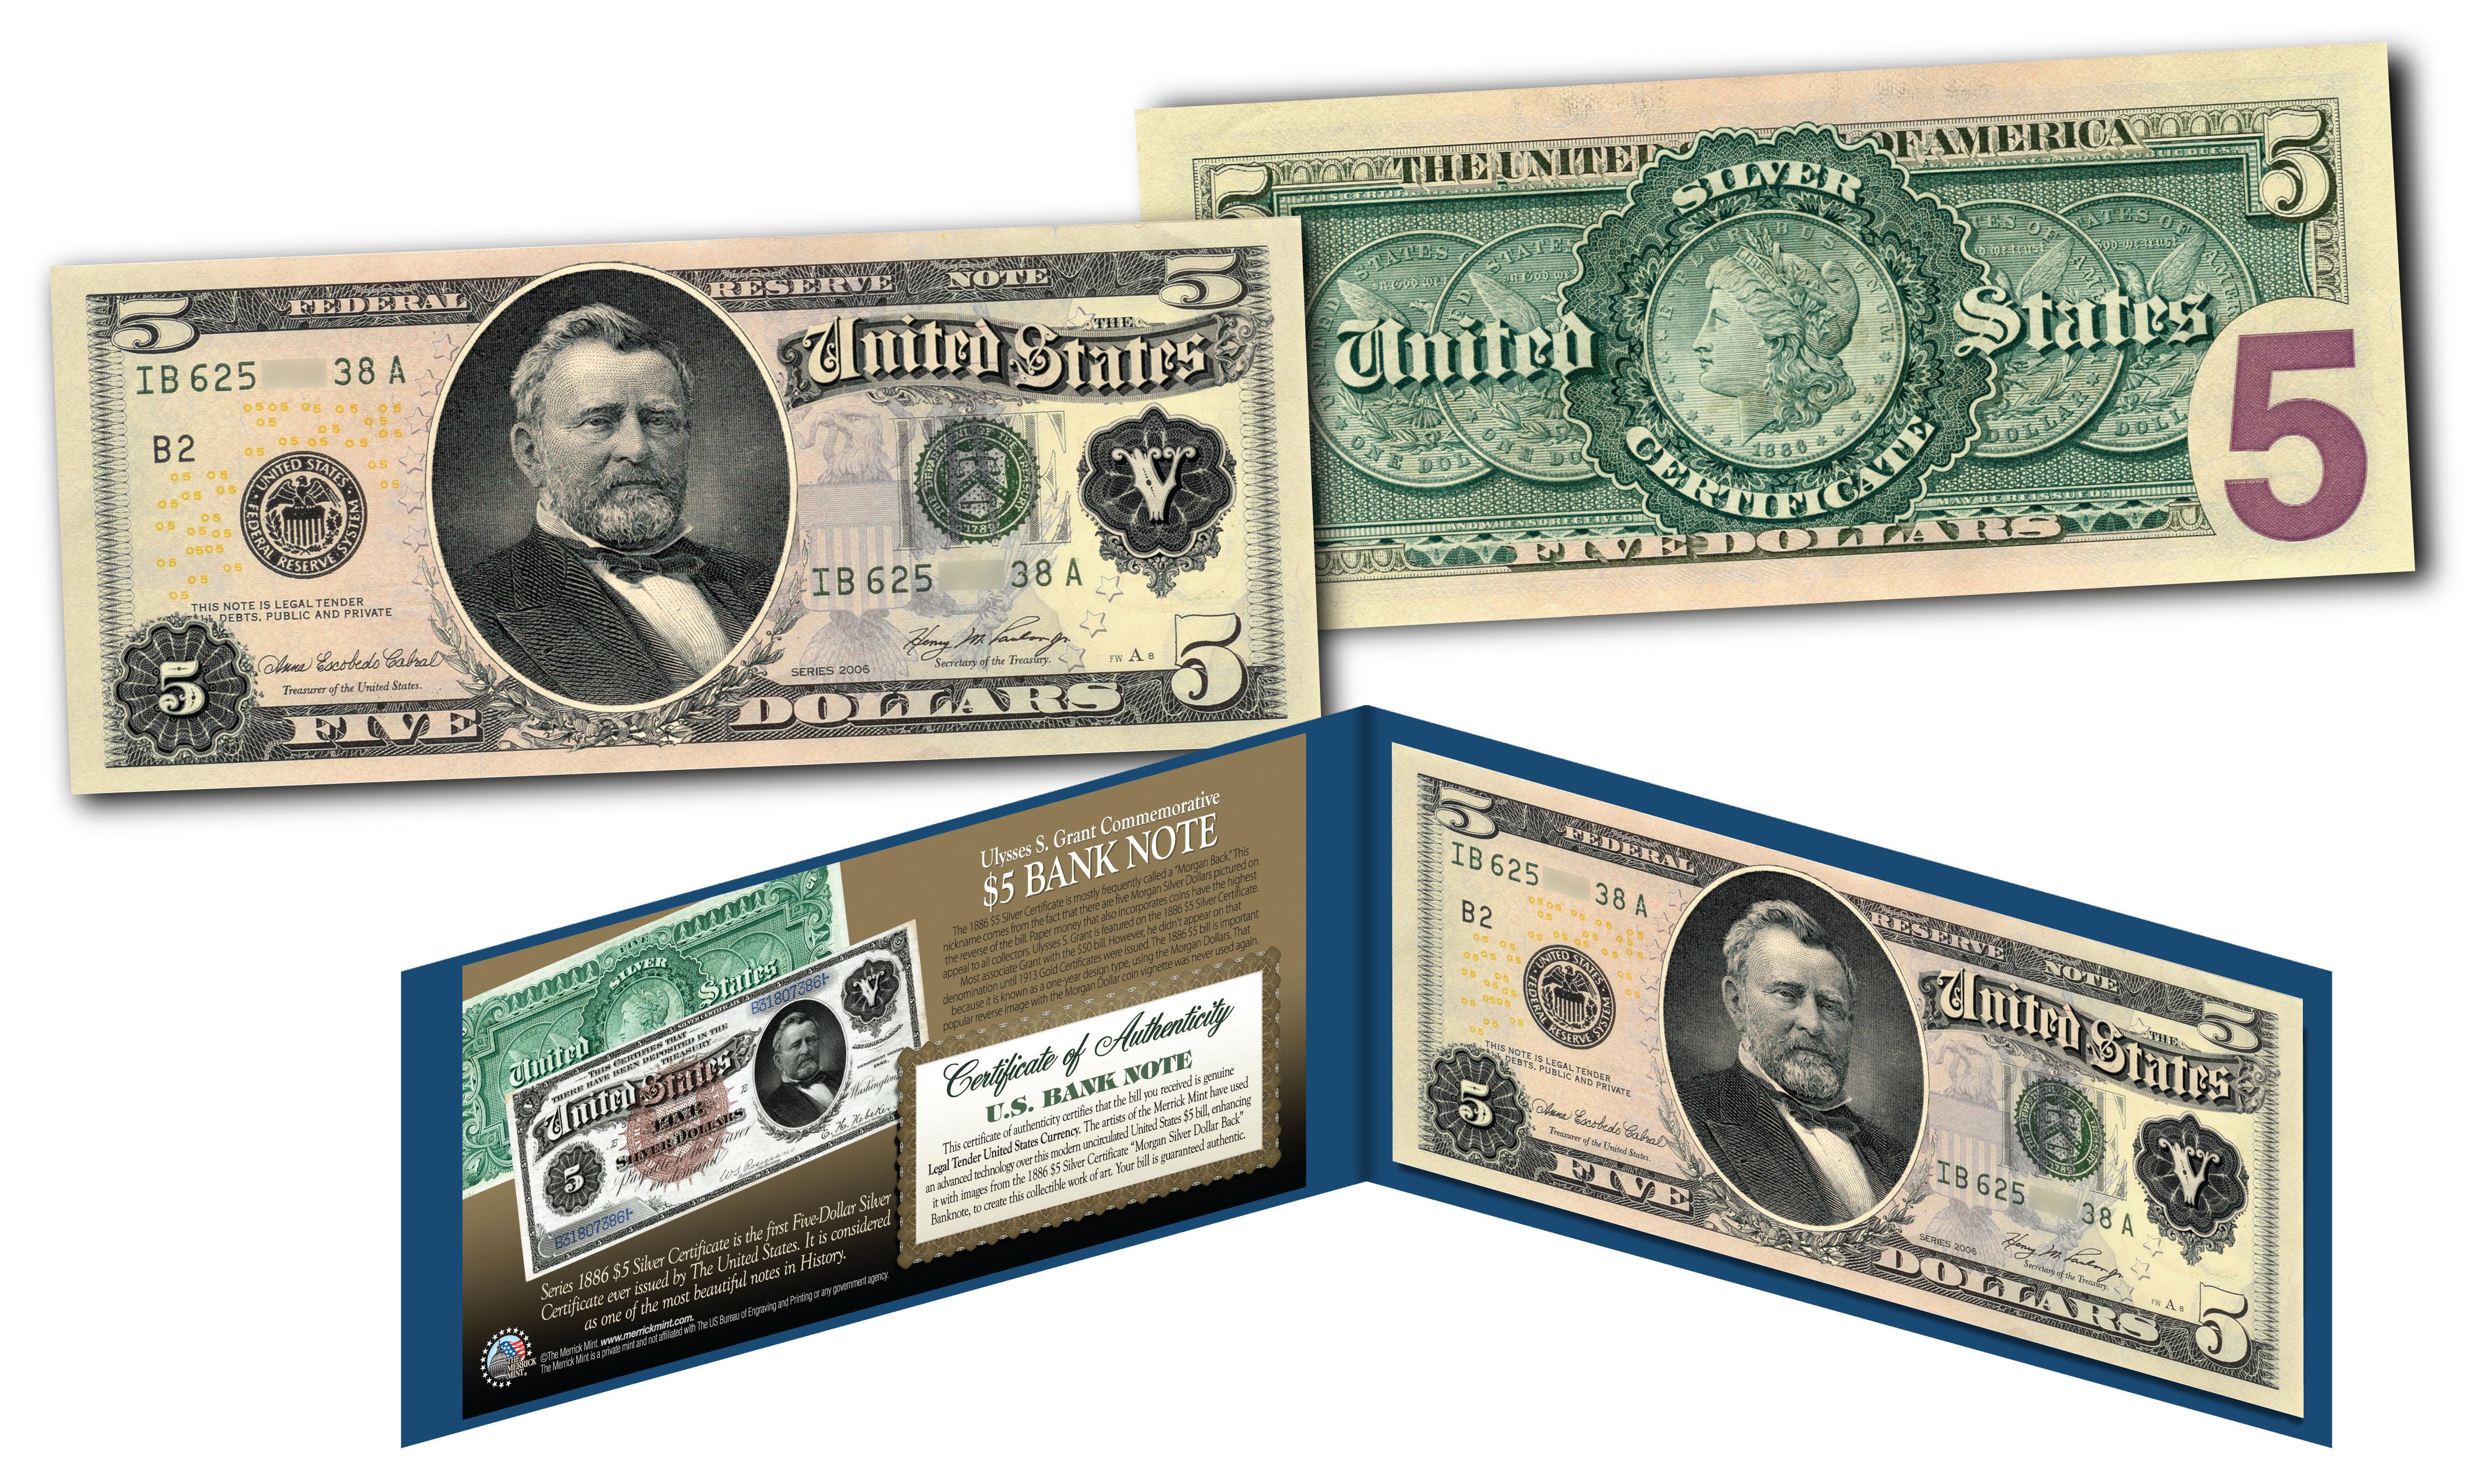 Morgan Silver Back 1886 5 Grant Silver Certificate Banknote On